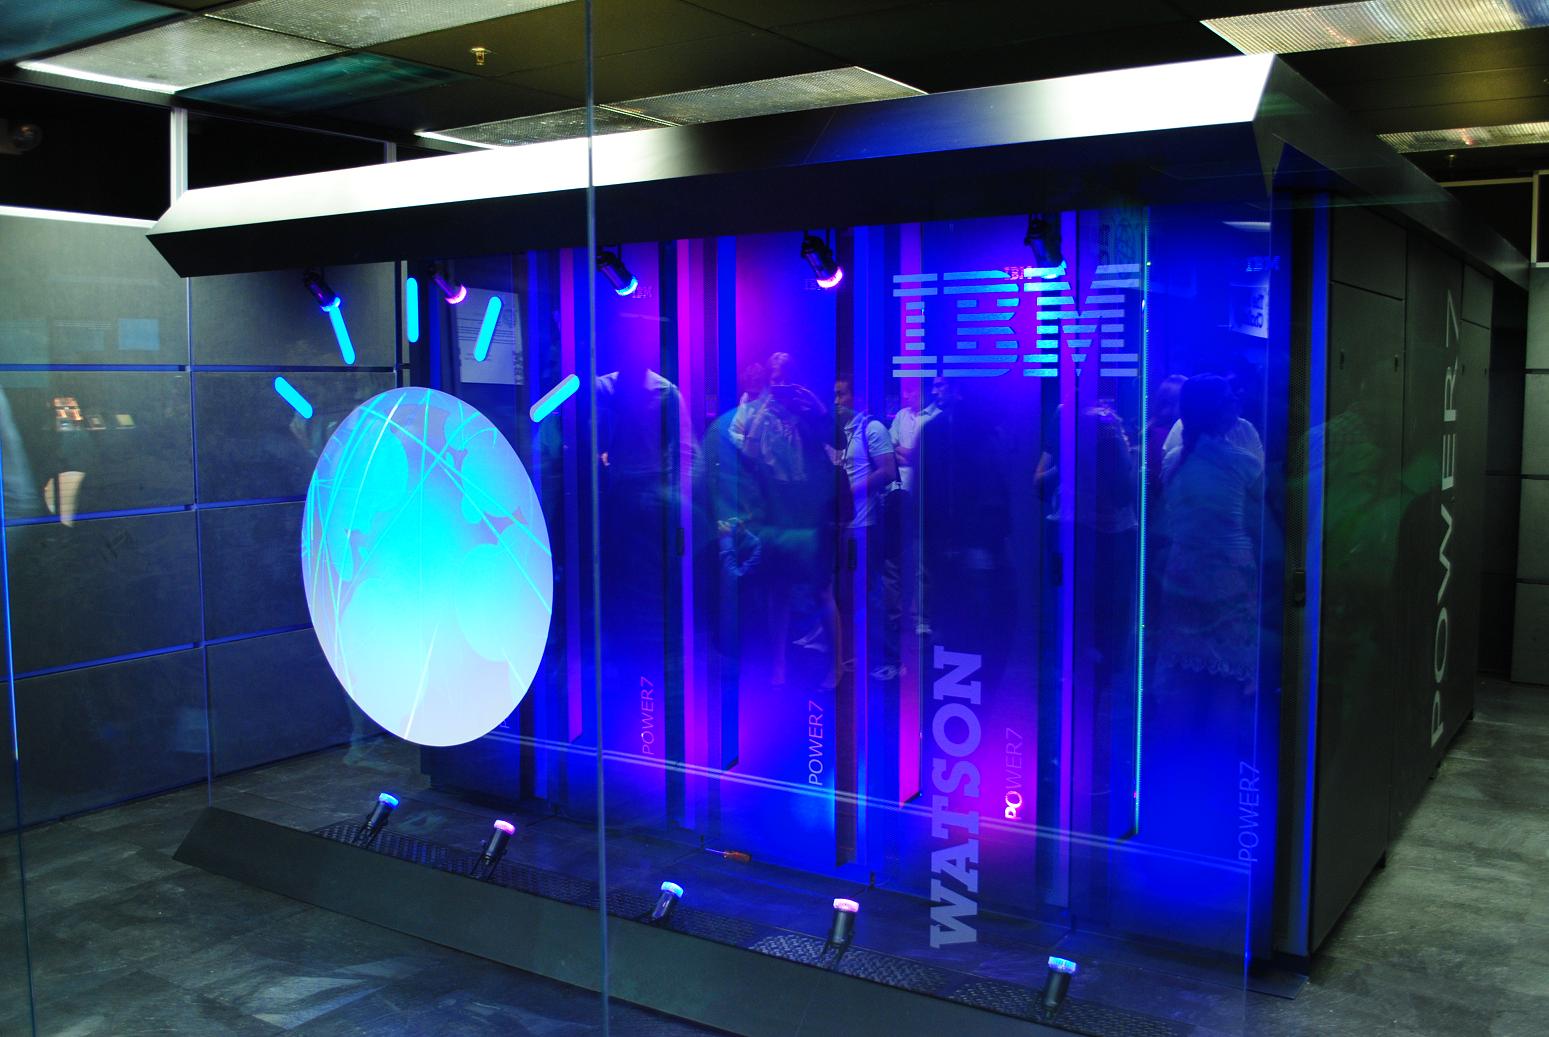 IBM's Watson computer, Yorktown Heights, NY. Via: WikiMedia